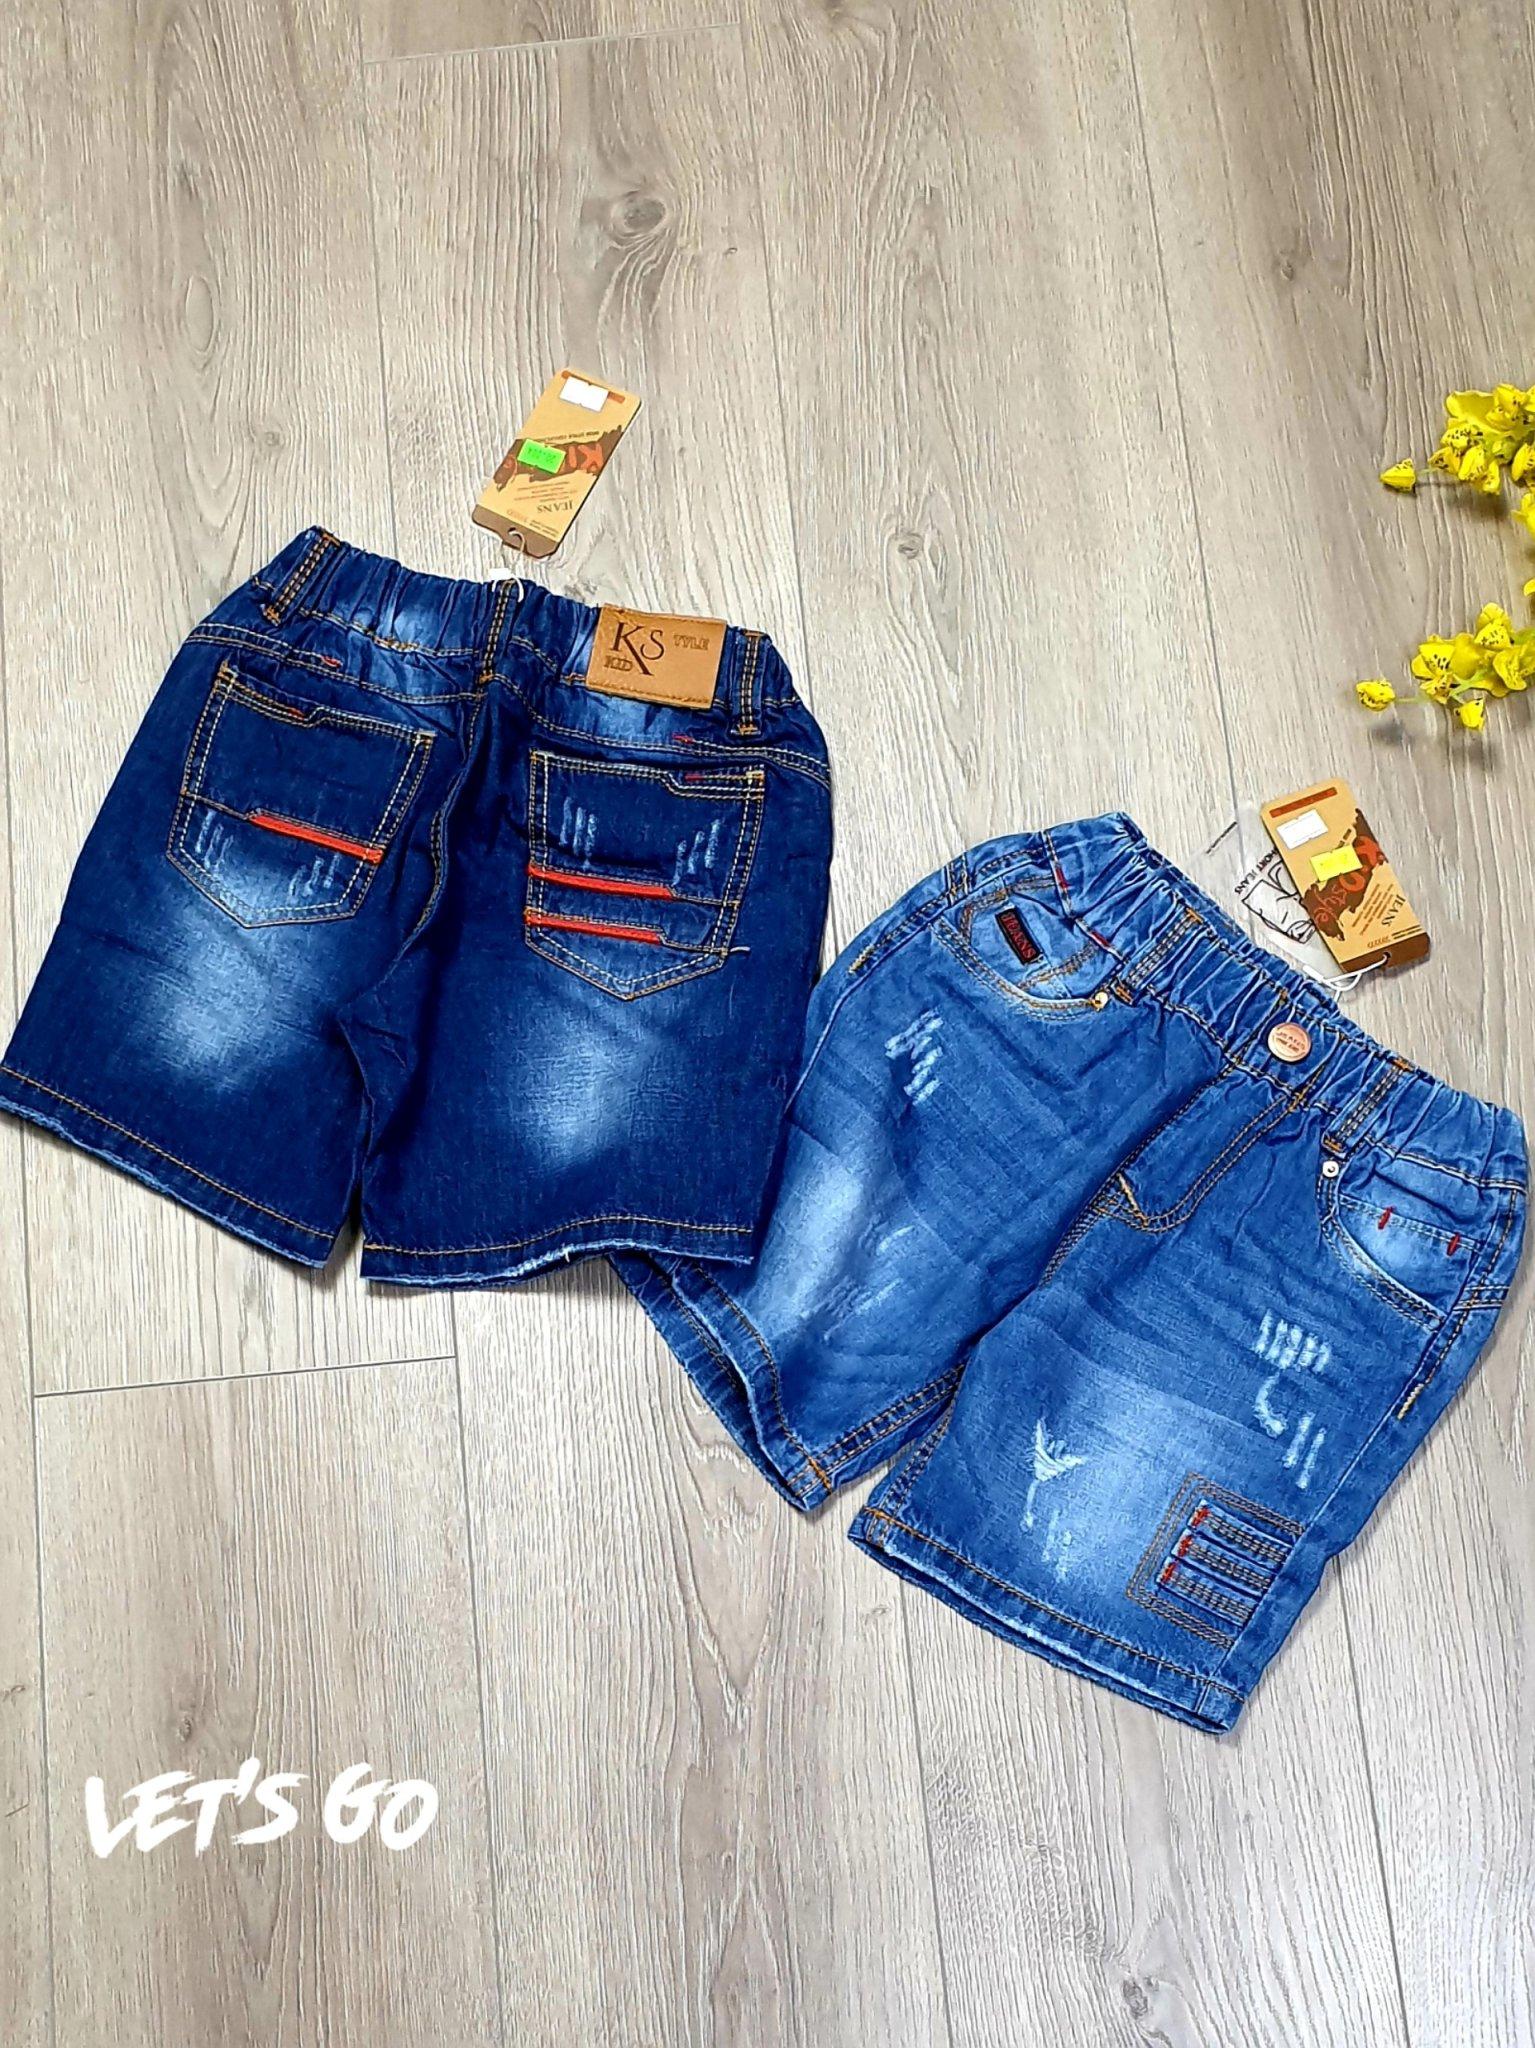 QT100401 - Short jean đùi KIDSTYLE